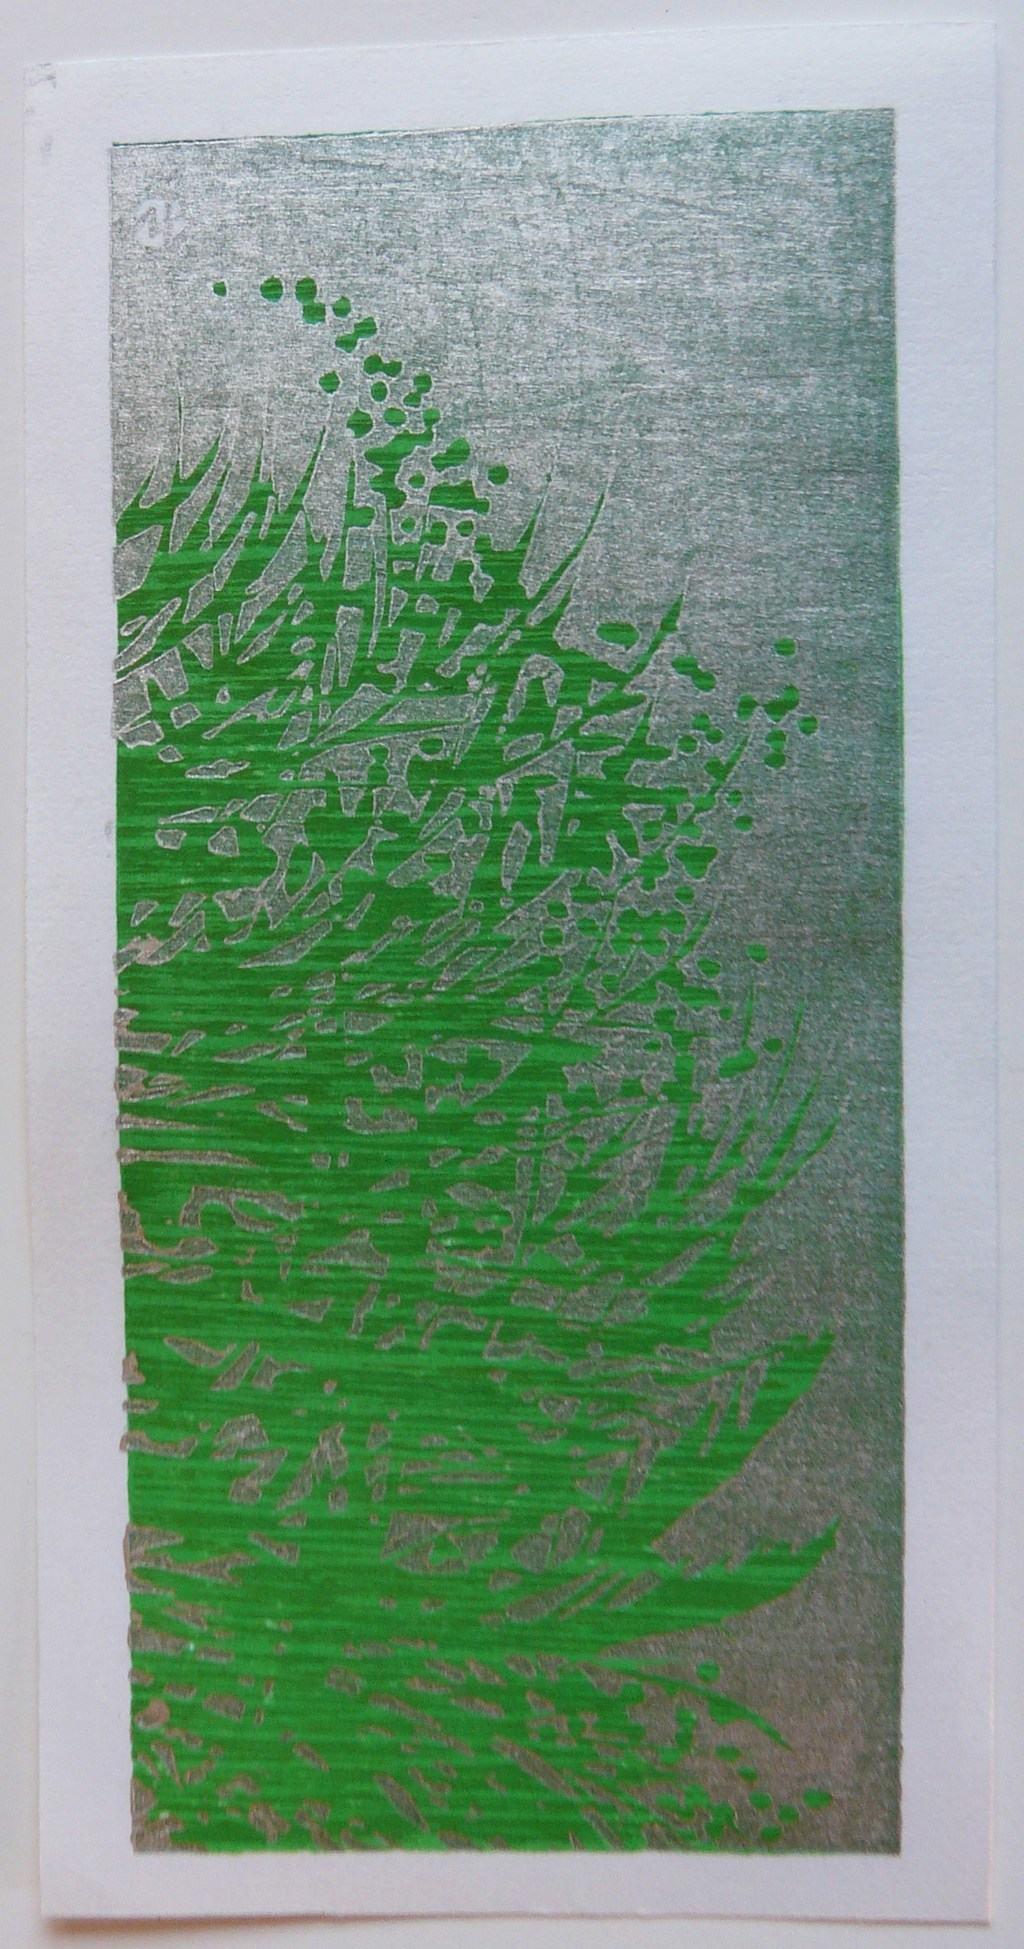 SANO TAKAO: #P4163 GREEN TREE